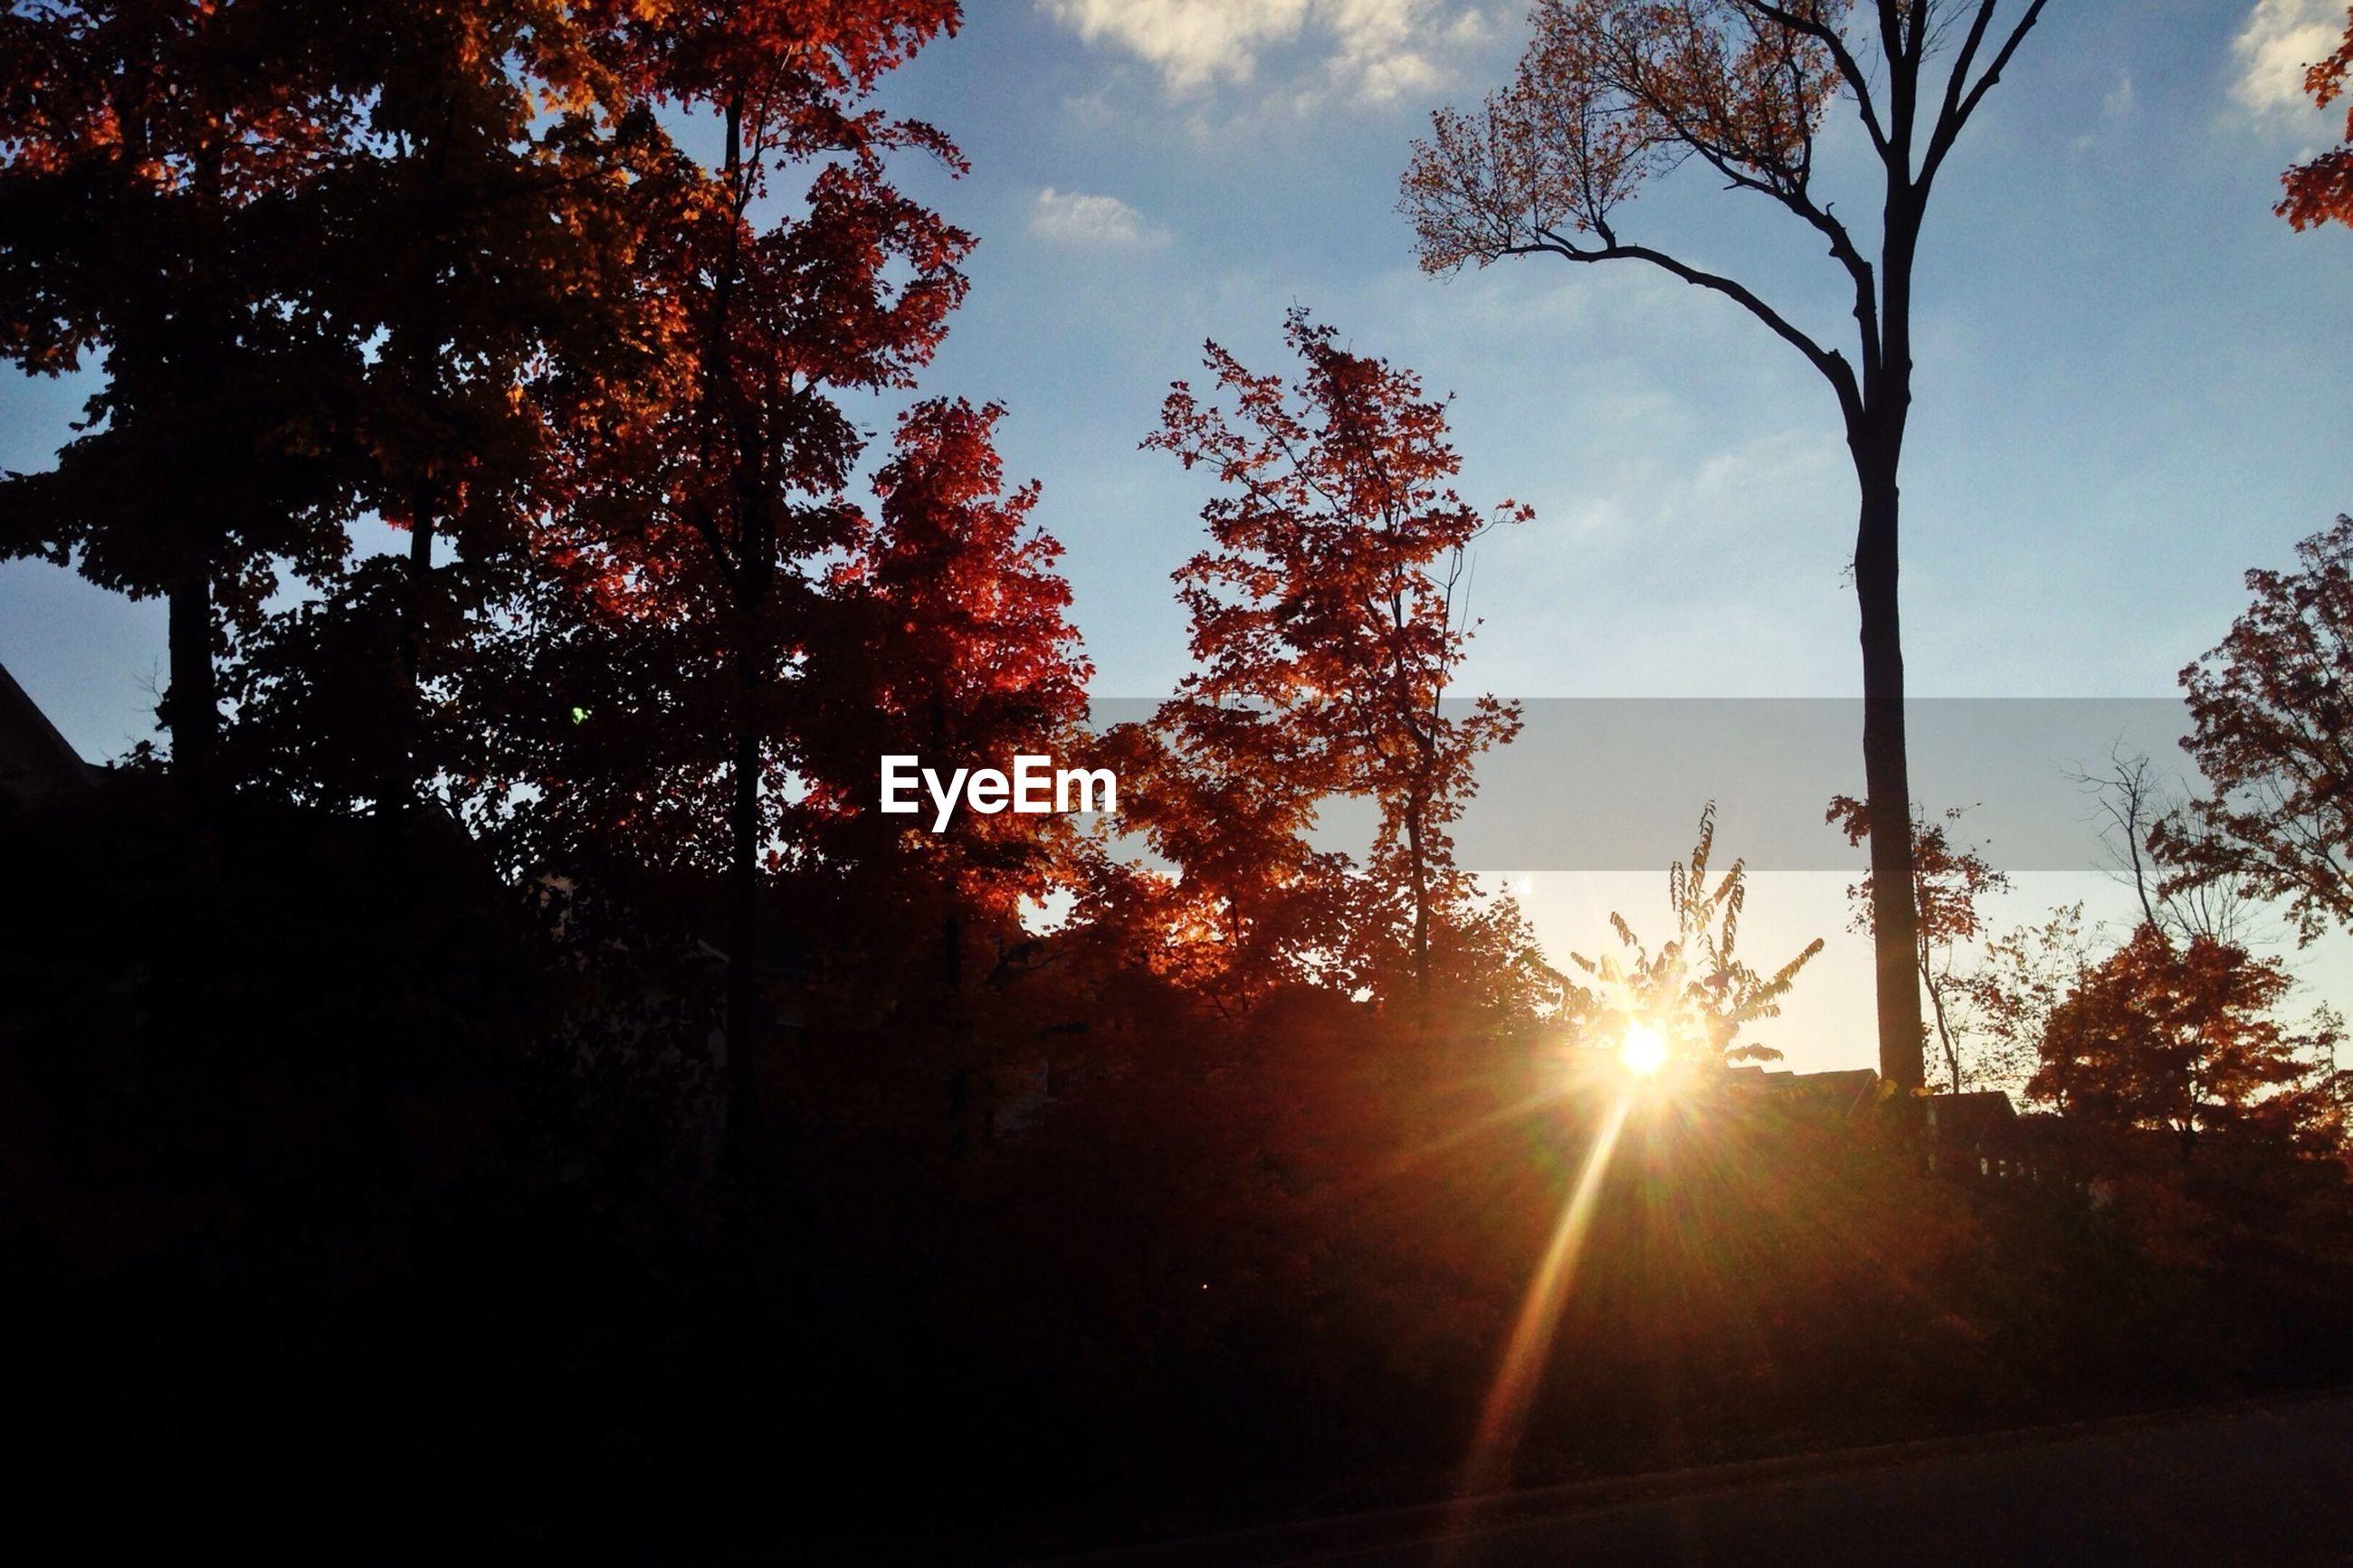 Sunrise with autumn tree